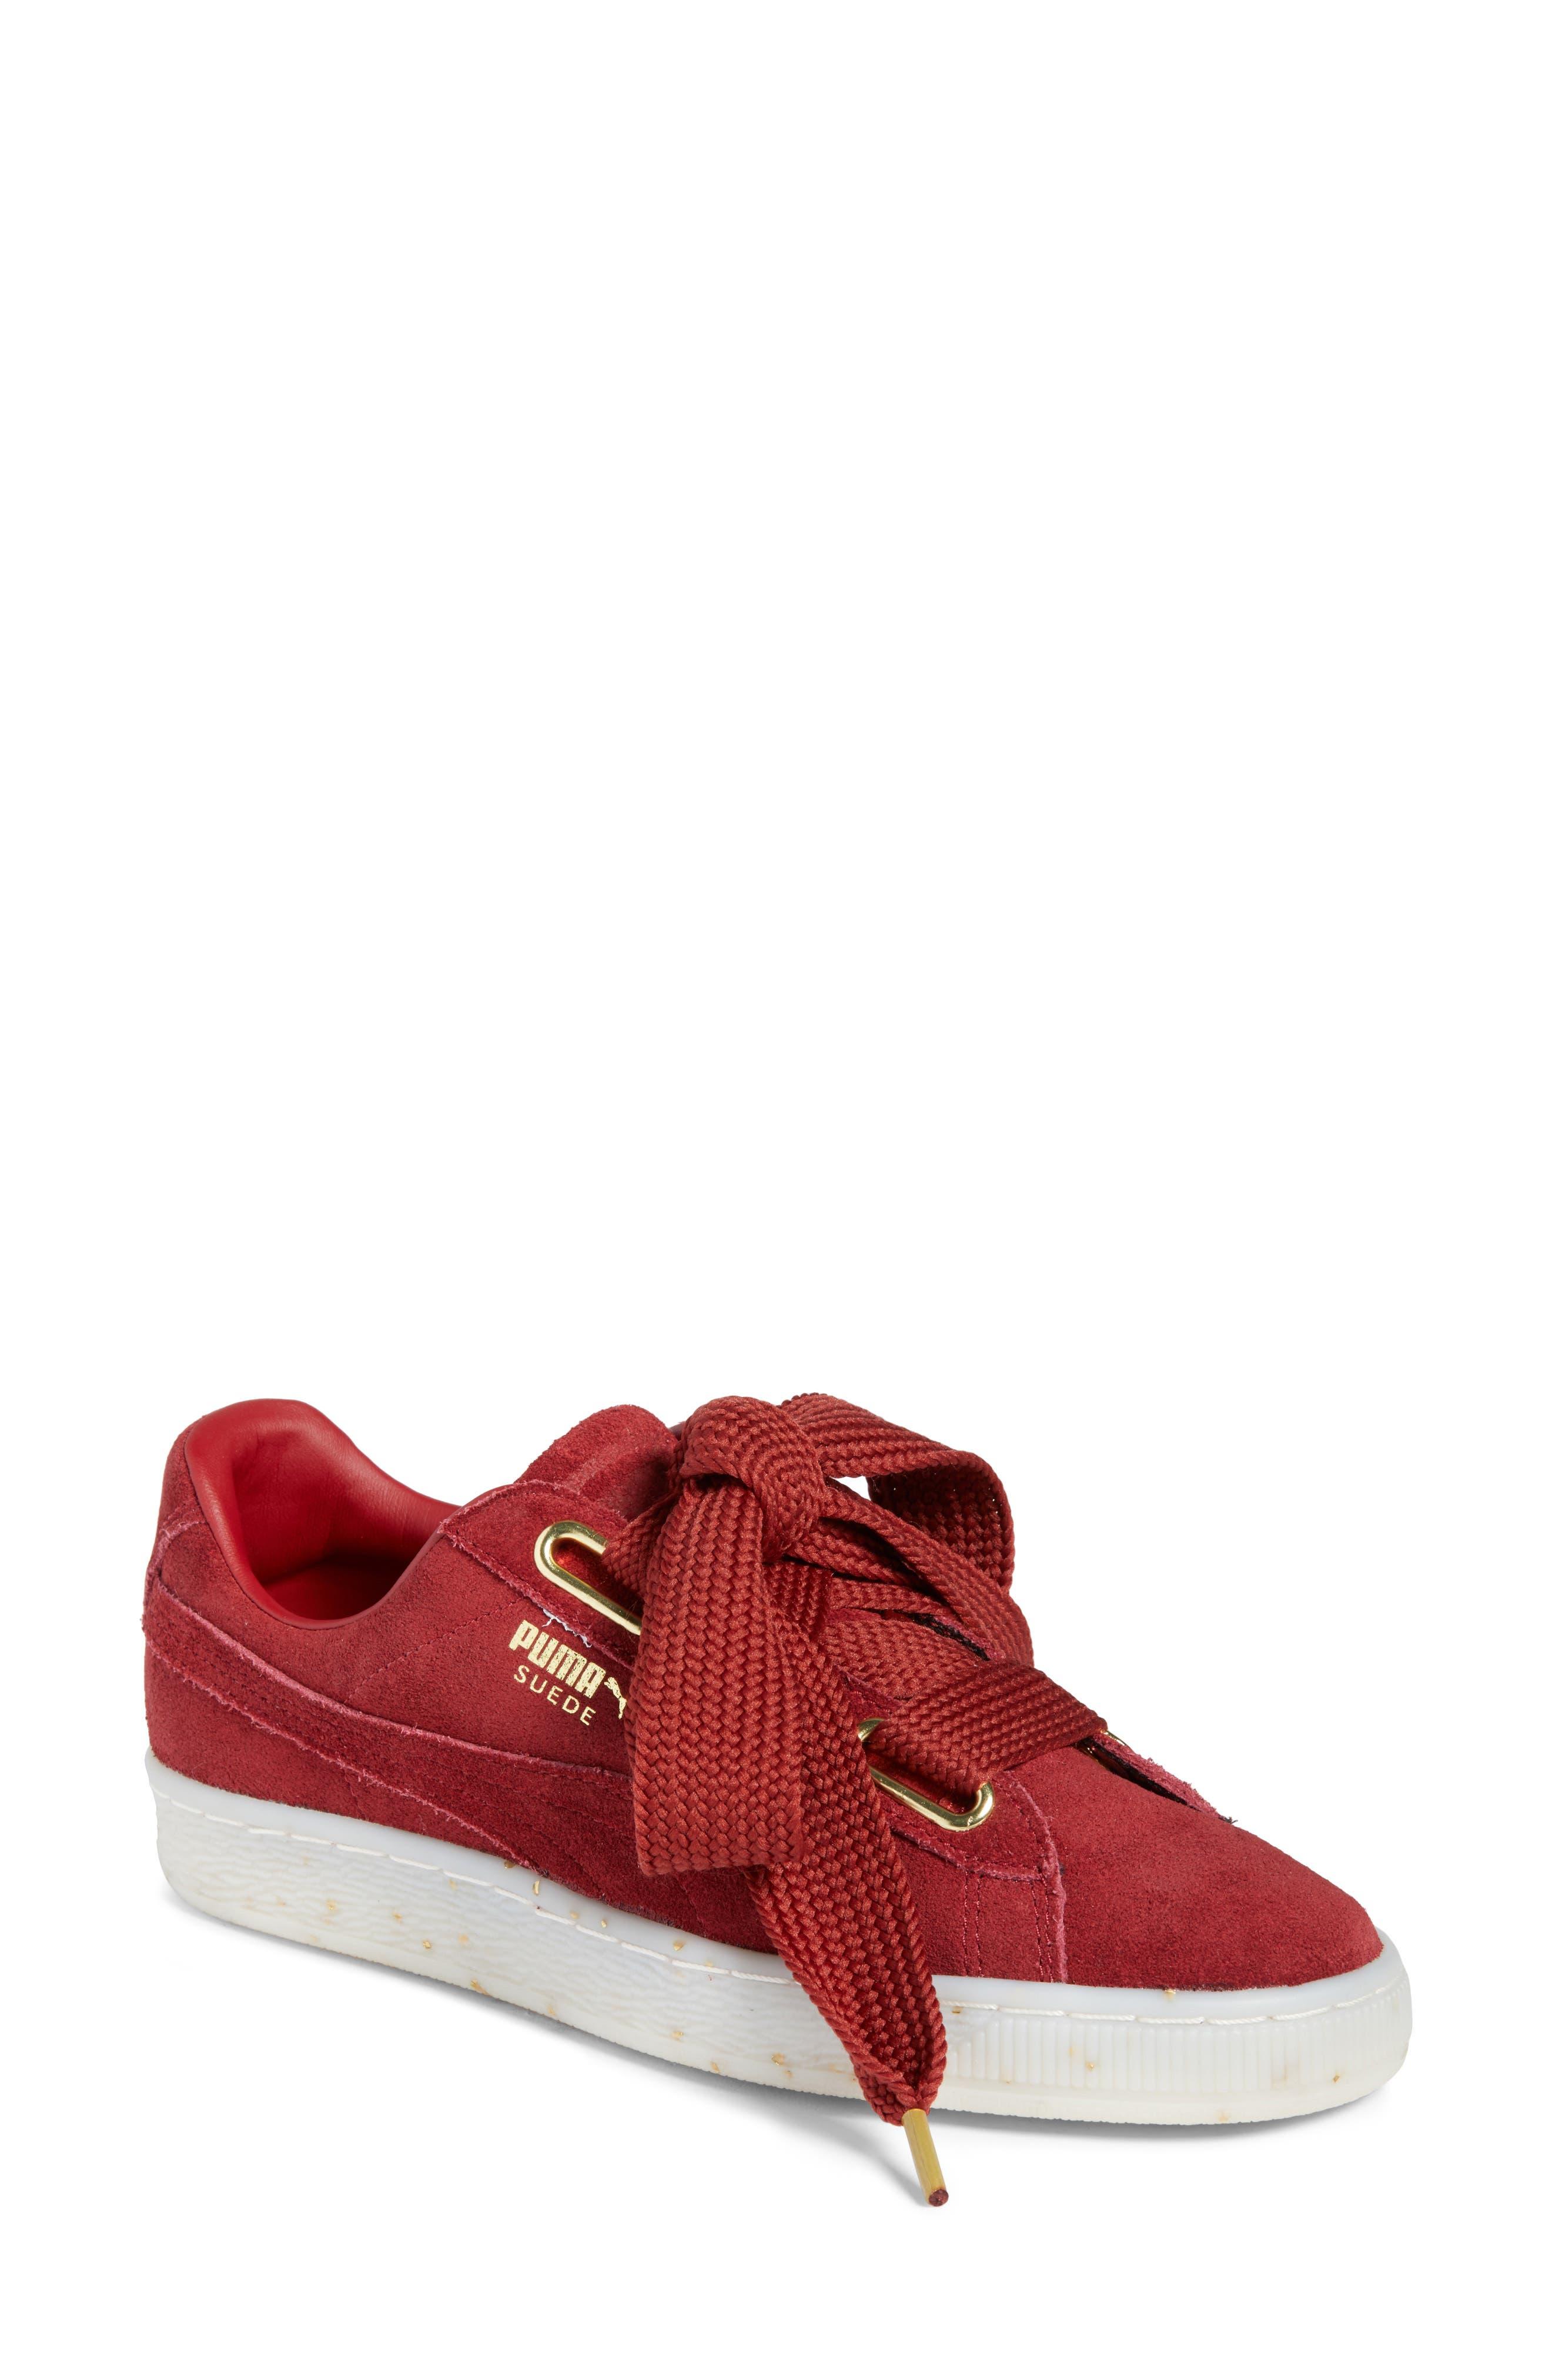 Main Image - PUMA Suede - Heart Sneaker (Women)